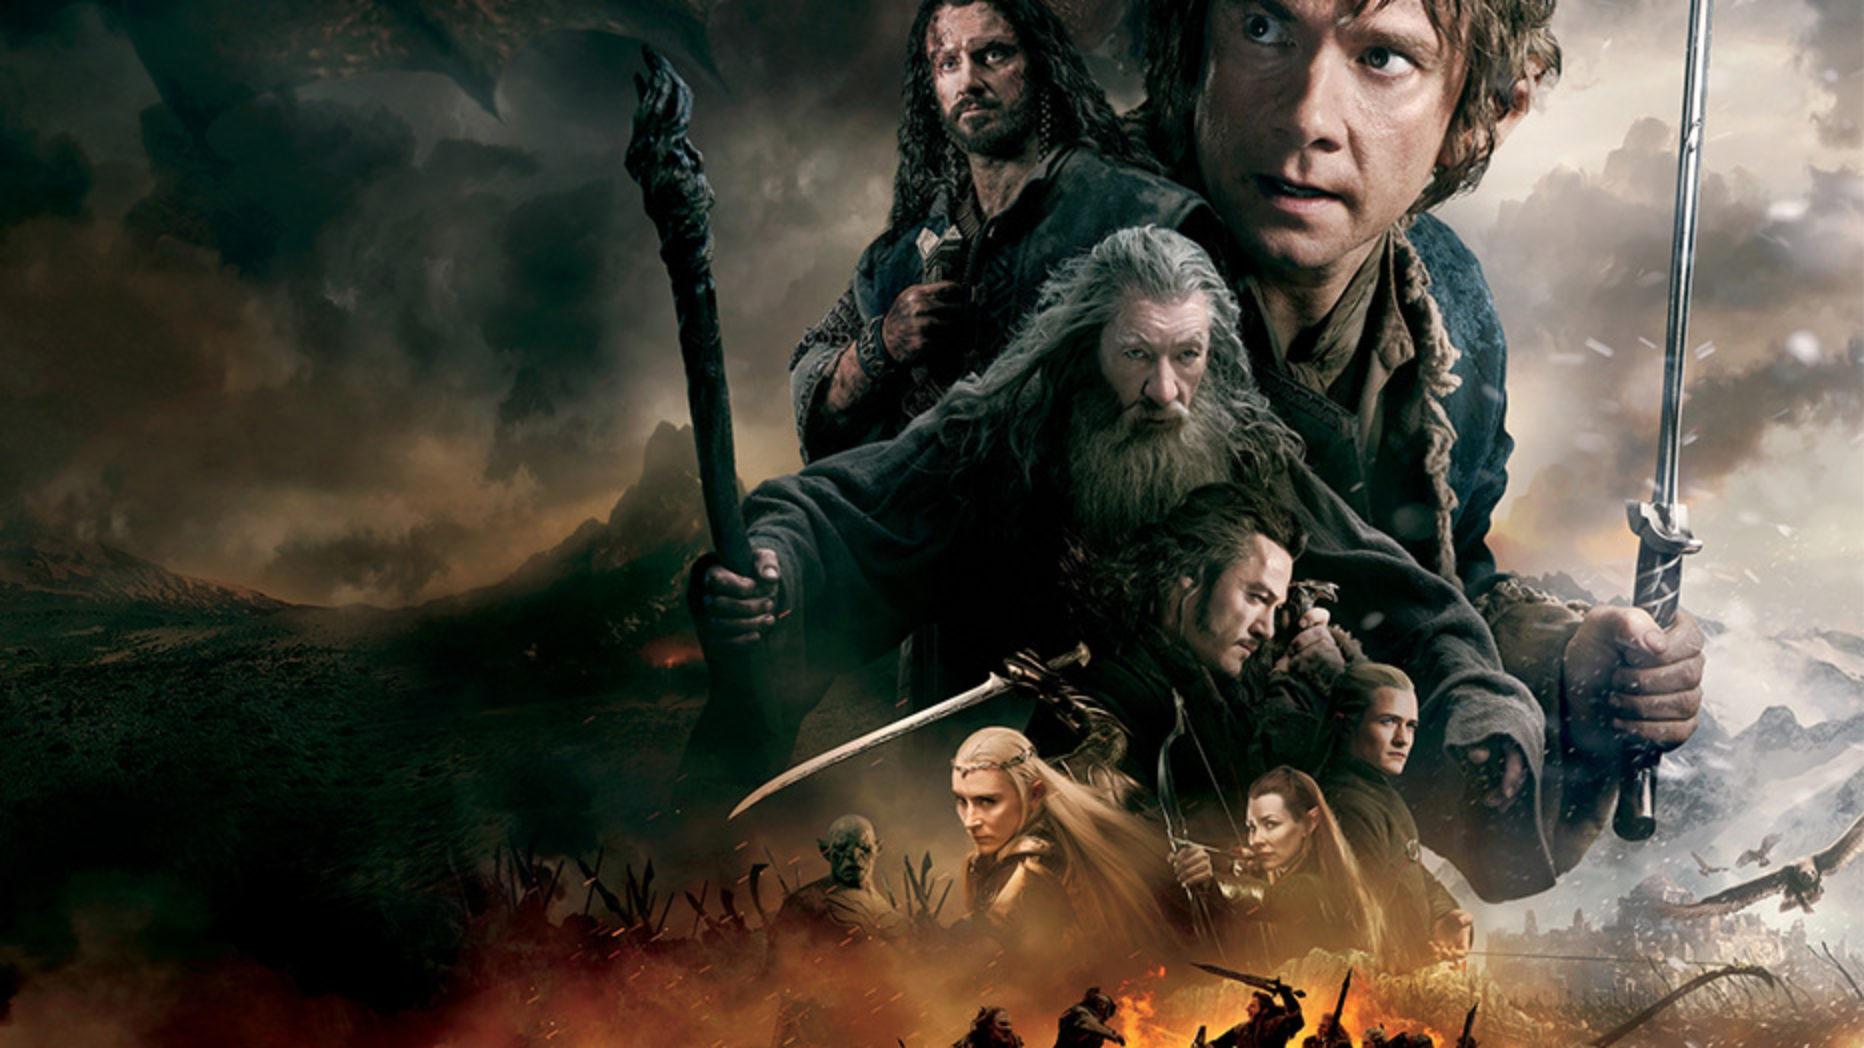 The Hobbit: The Battle of Five Armies – IMAX 3D HFR